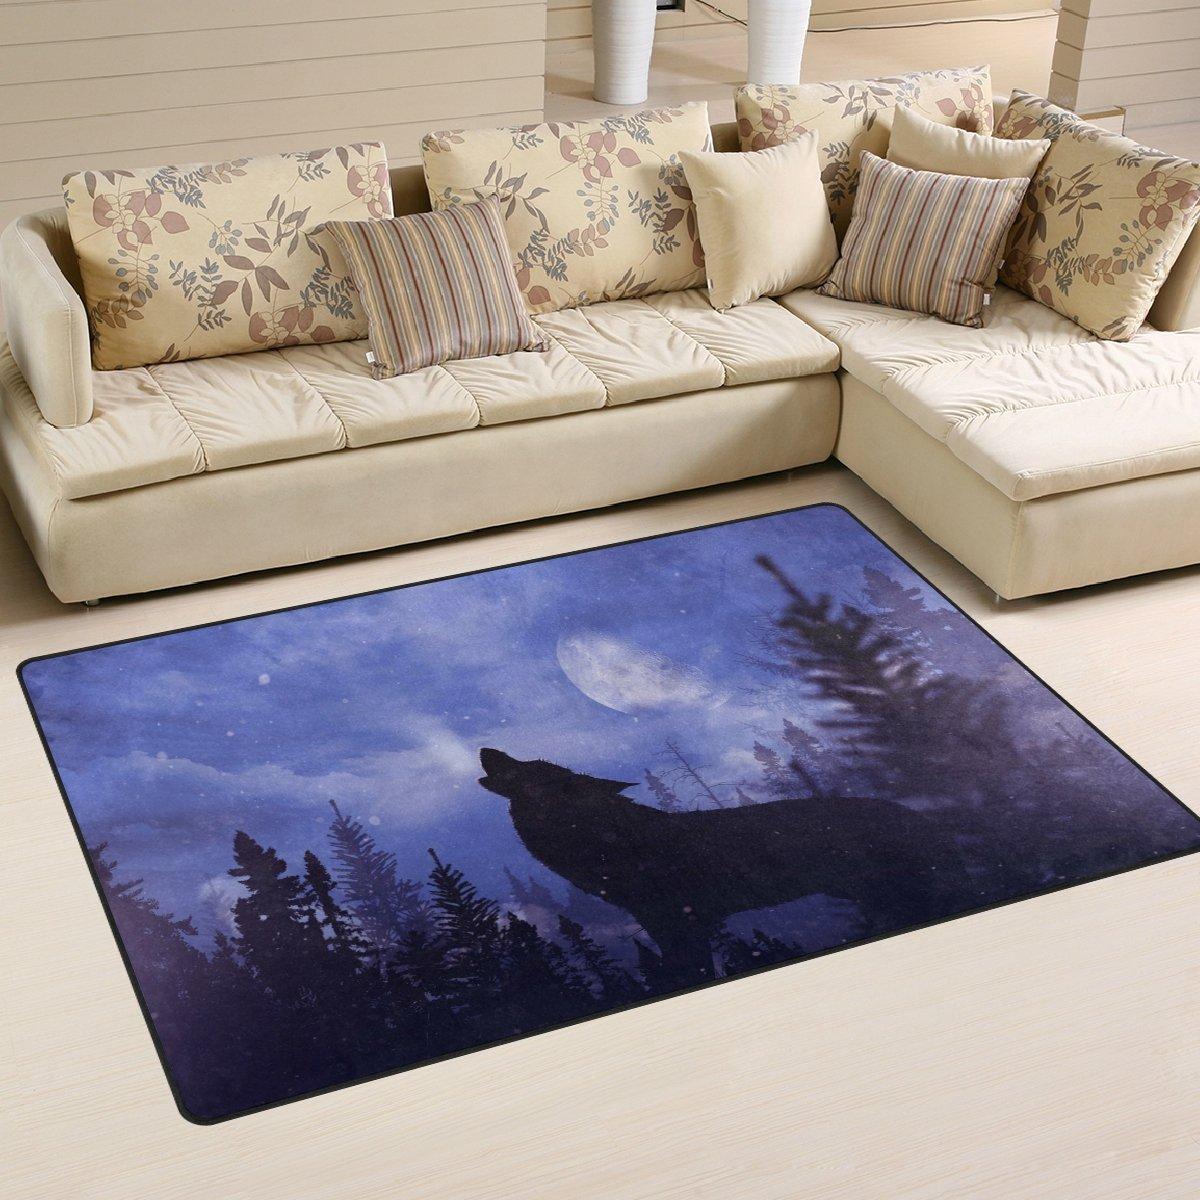 WOZO Moon Starry Forest Wolf Animal Area Rug Rugs Non-Slip Floor Mat Doormats Living Room Bedroom 60 x 39 inches